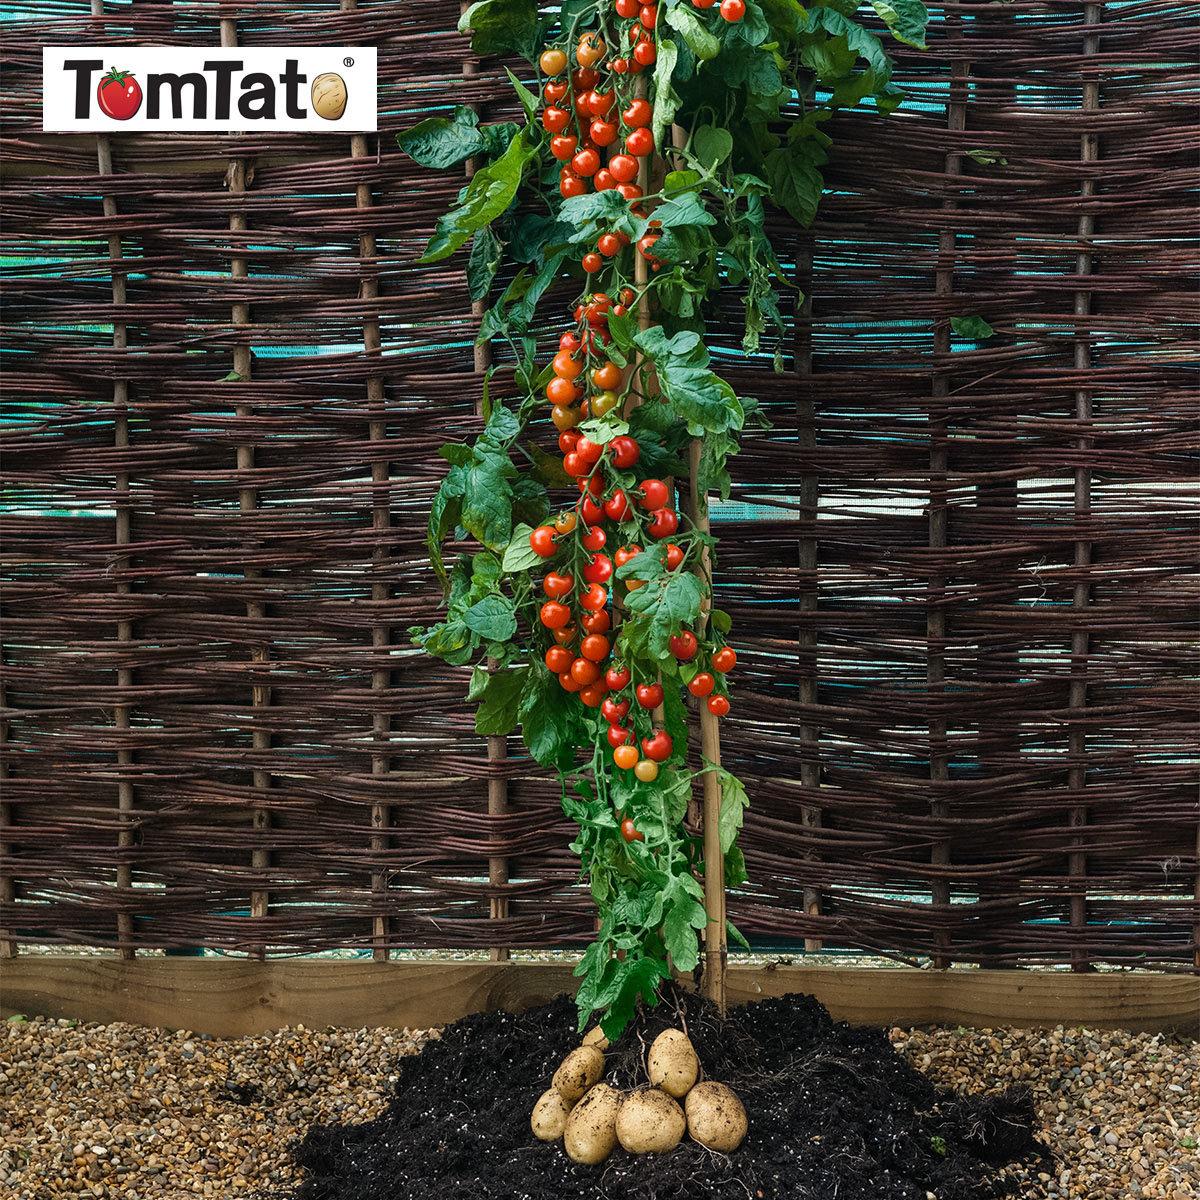 Tomaten-Kartoffelpflanze TomTato, veredelt, im ca. 12 cm-Topf | #2